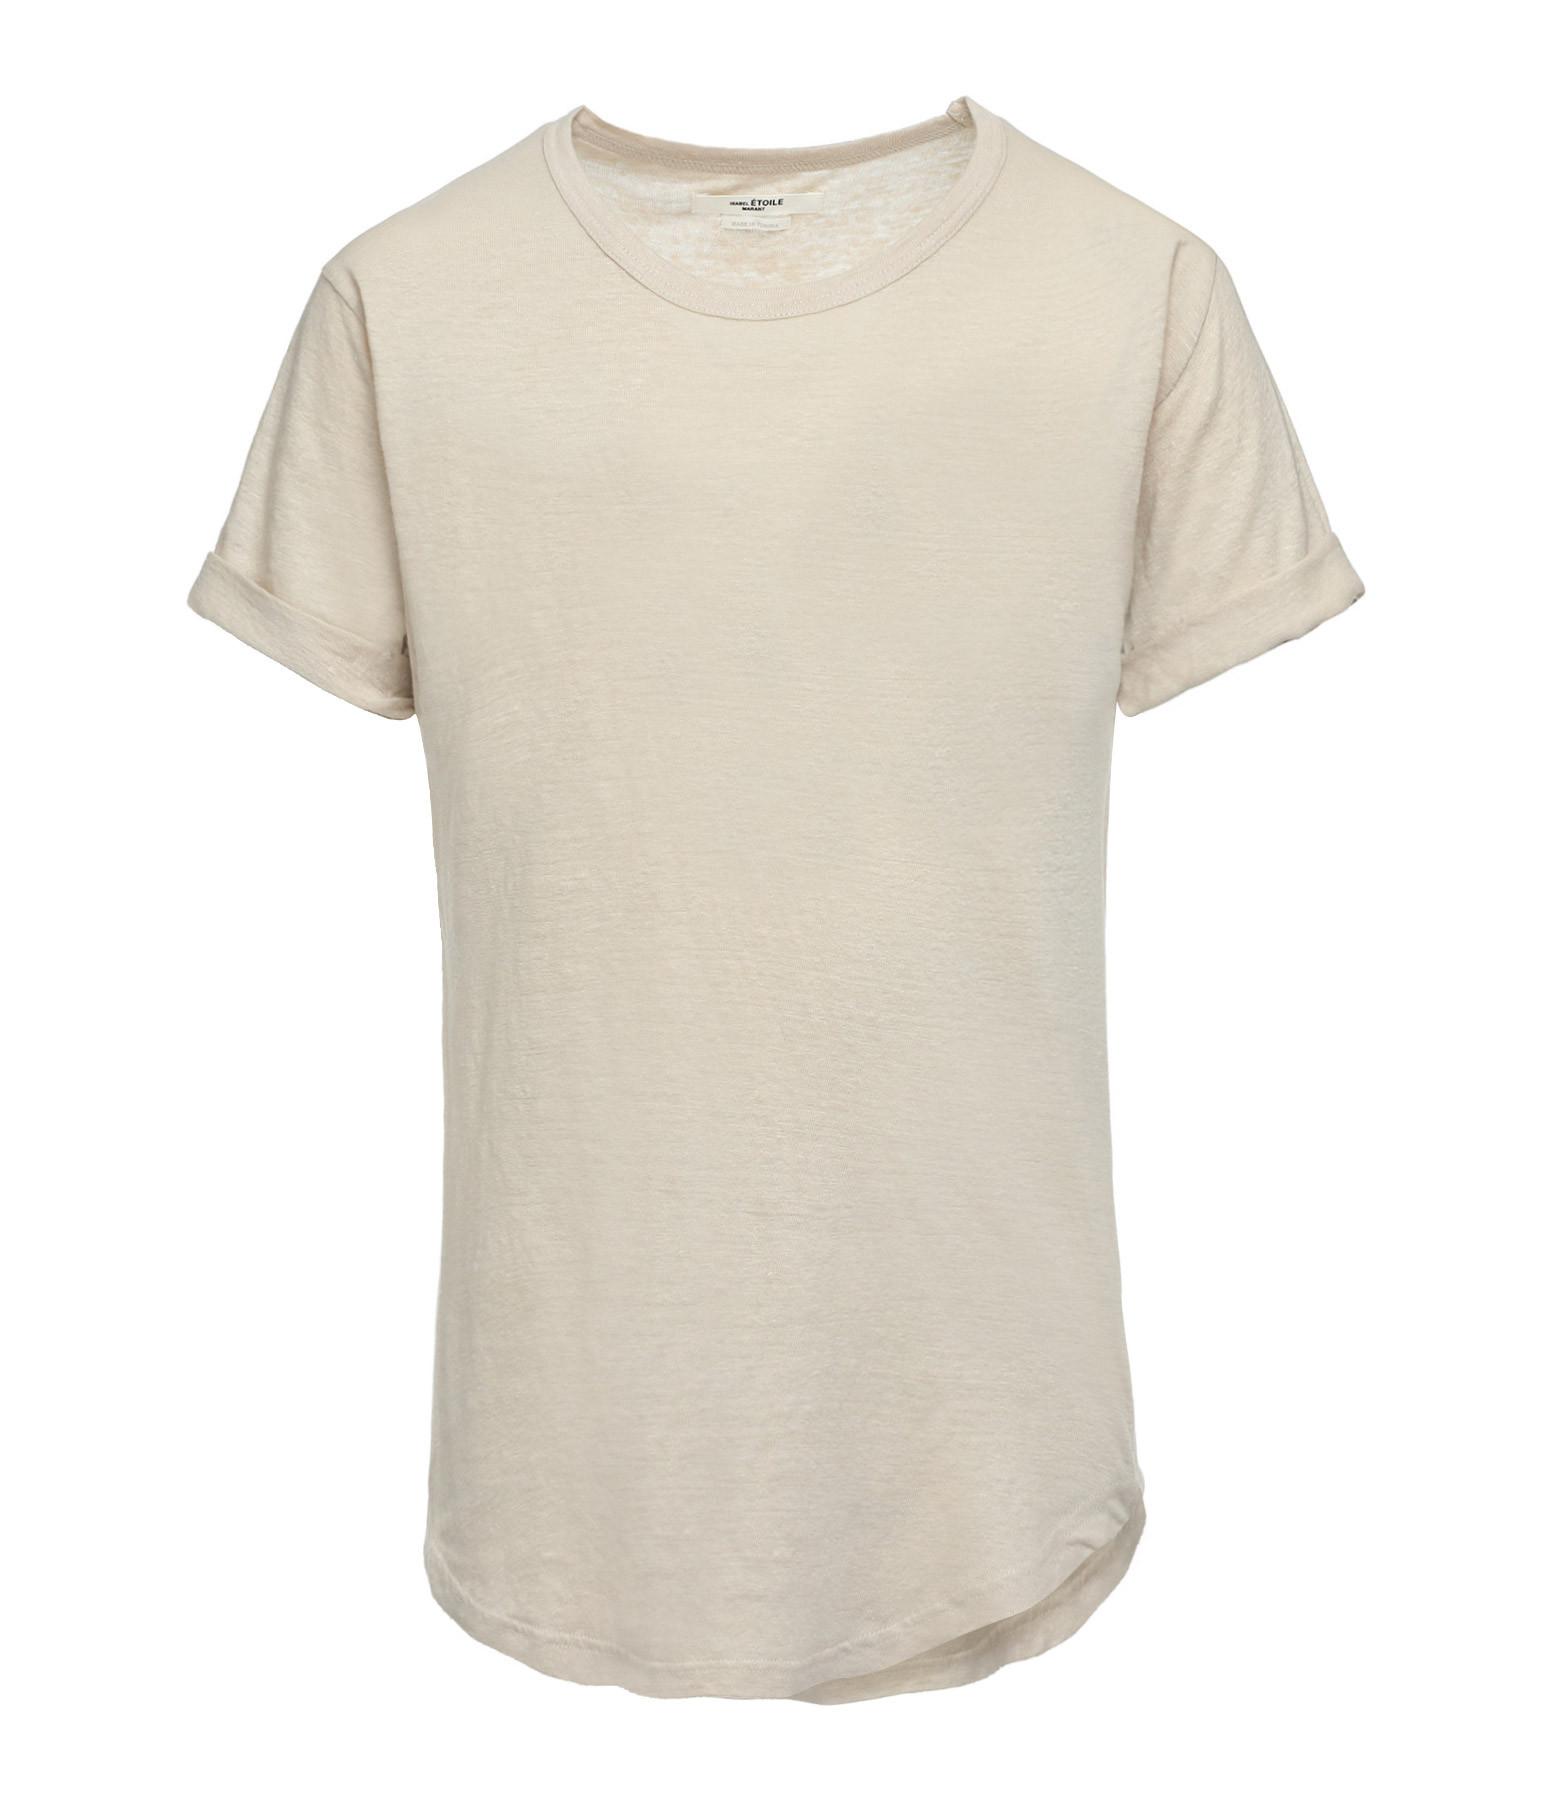 ISABEL MARANT ÉTOILE - Tee-shirt Koldi Lin Écru